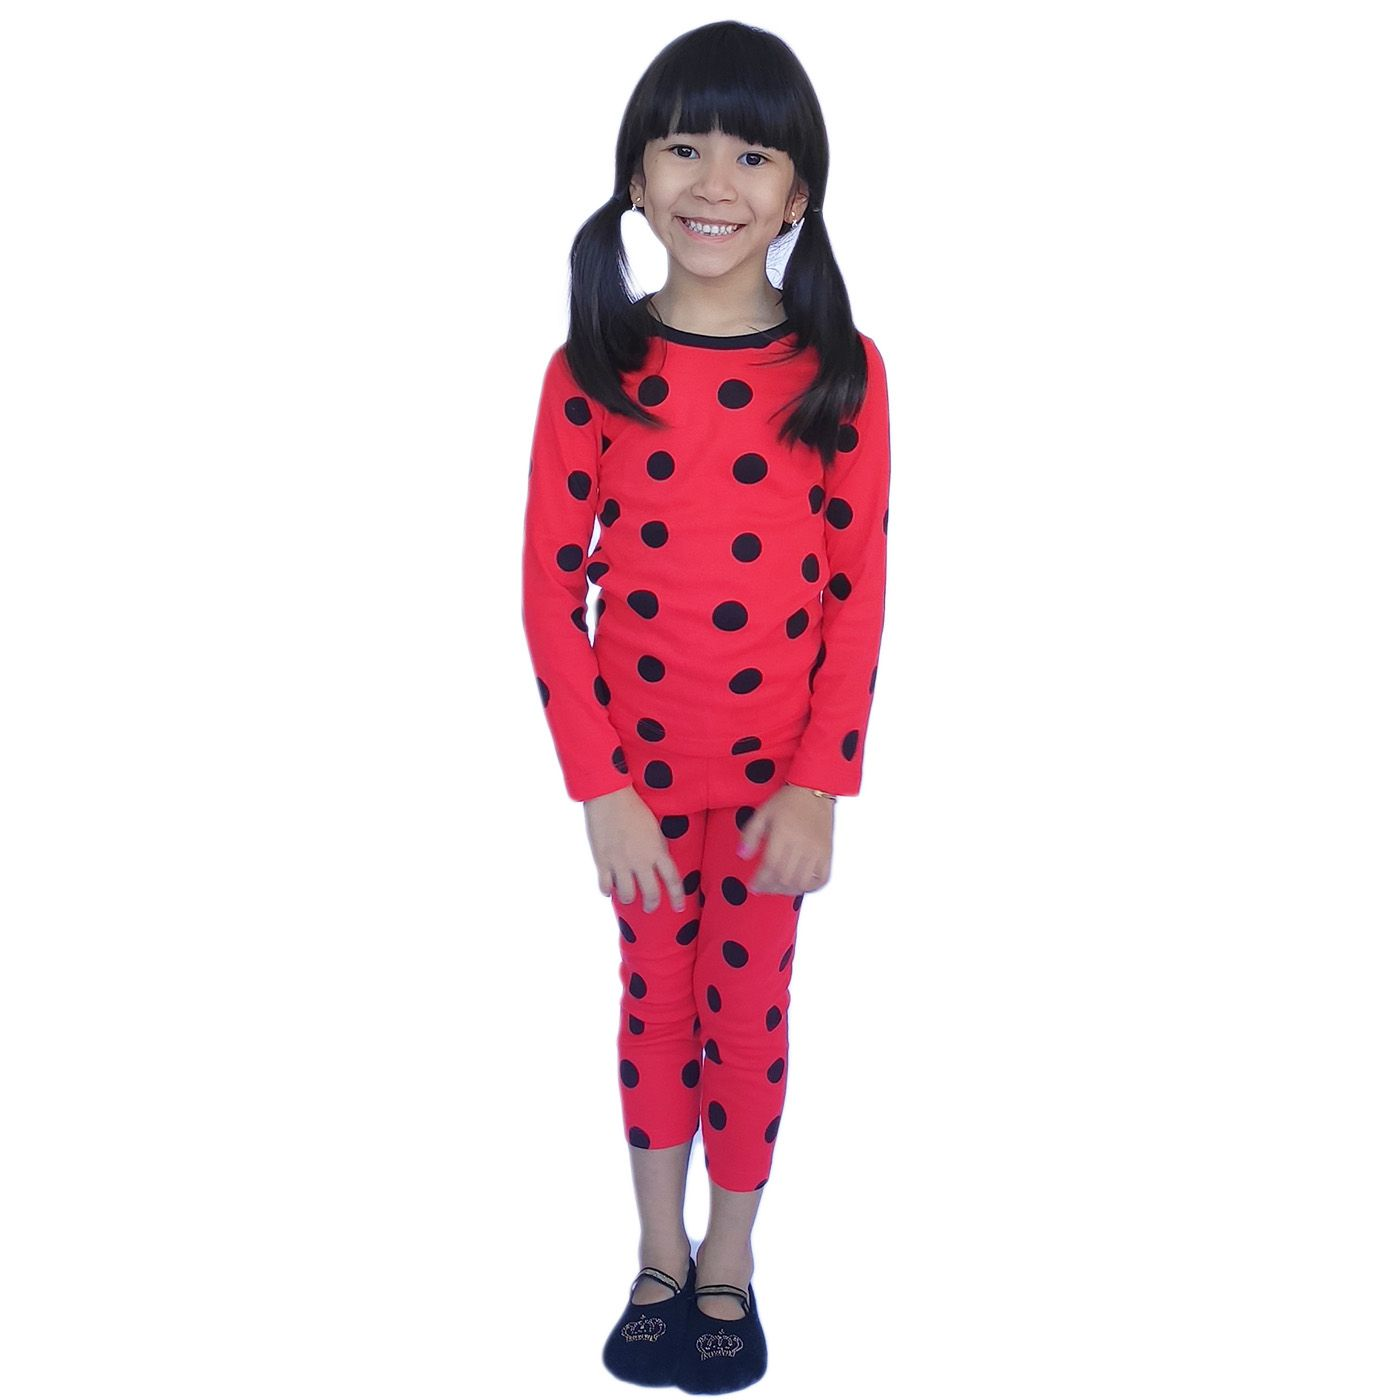 Pijama infantil menina ladybug inverno acompanha mascara